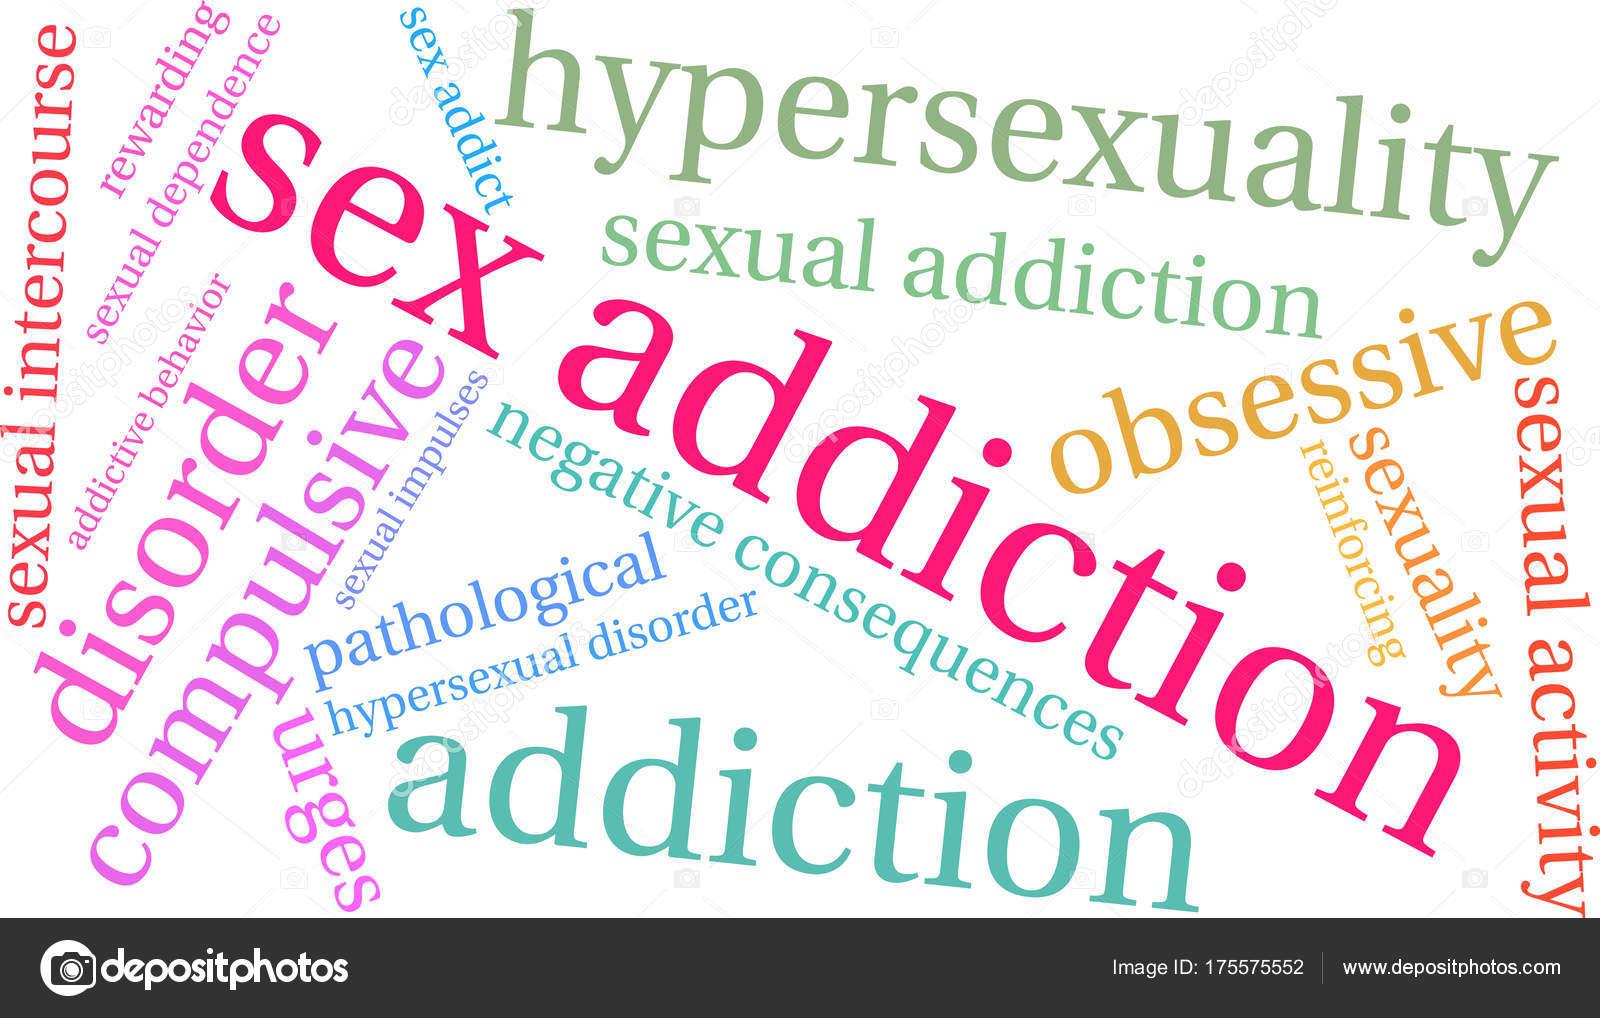 Negative outcomes of sexual addiction